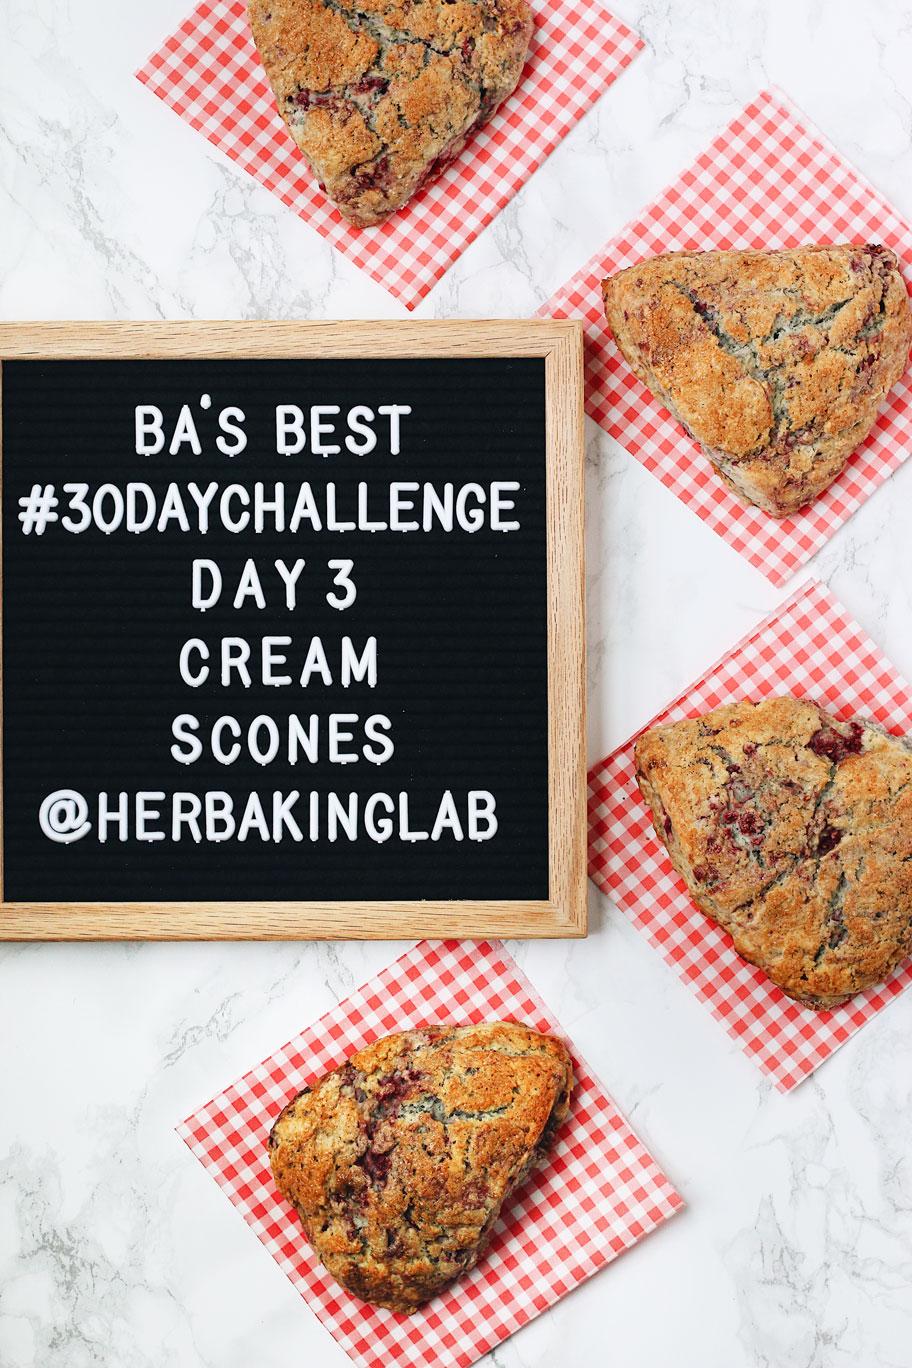 #ba30daychallenge-bon-appetit-best-recipes-day-3-cream-scones